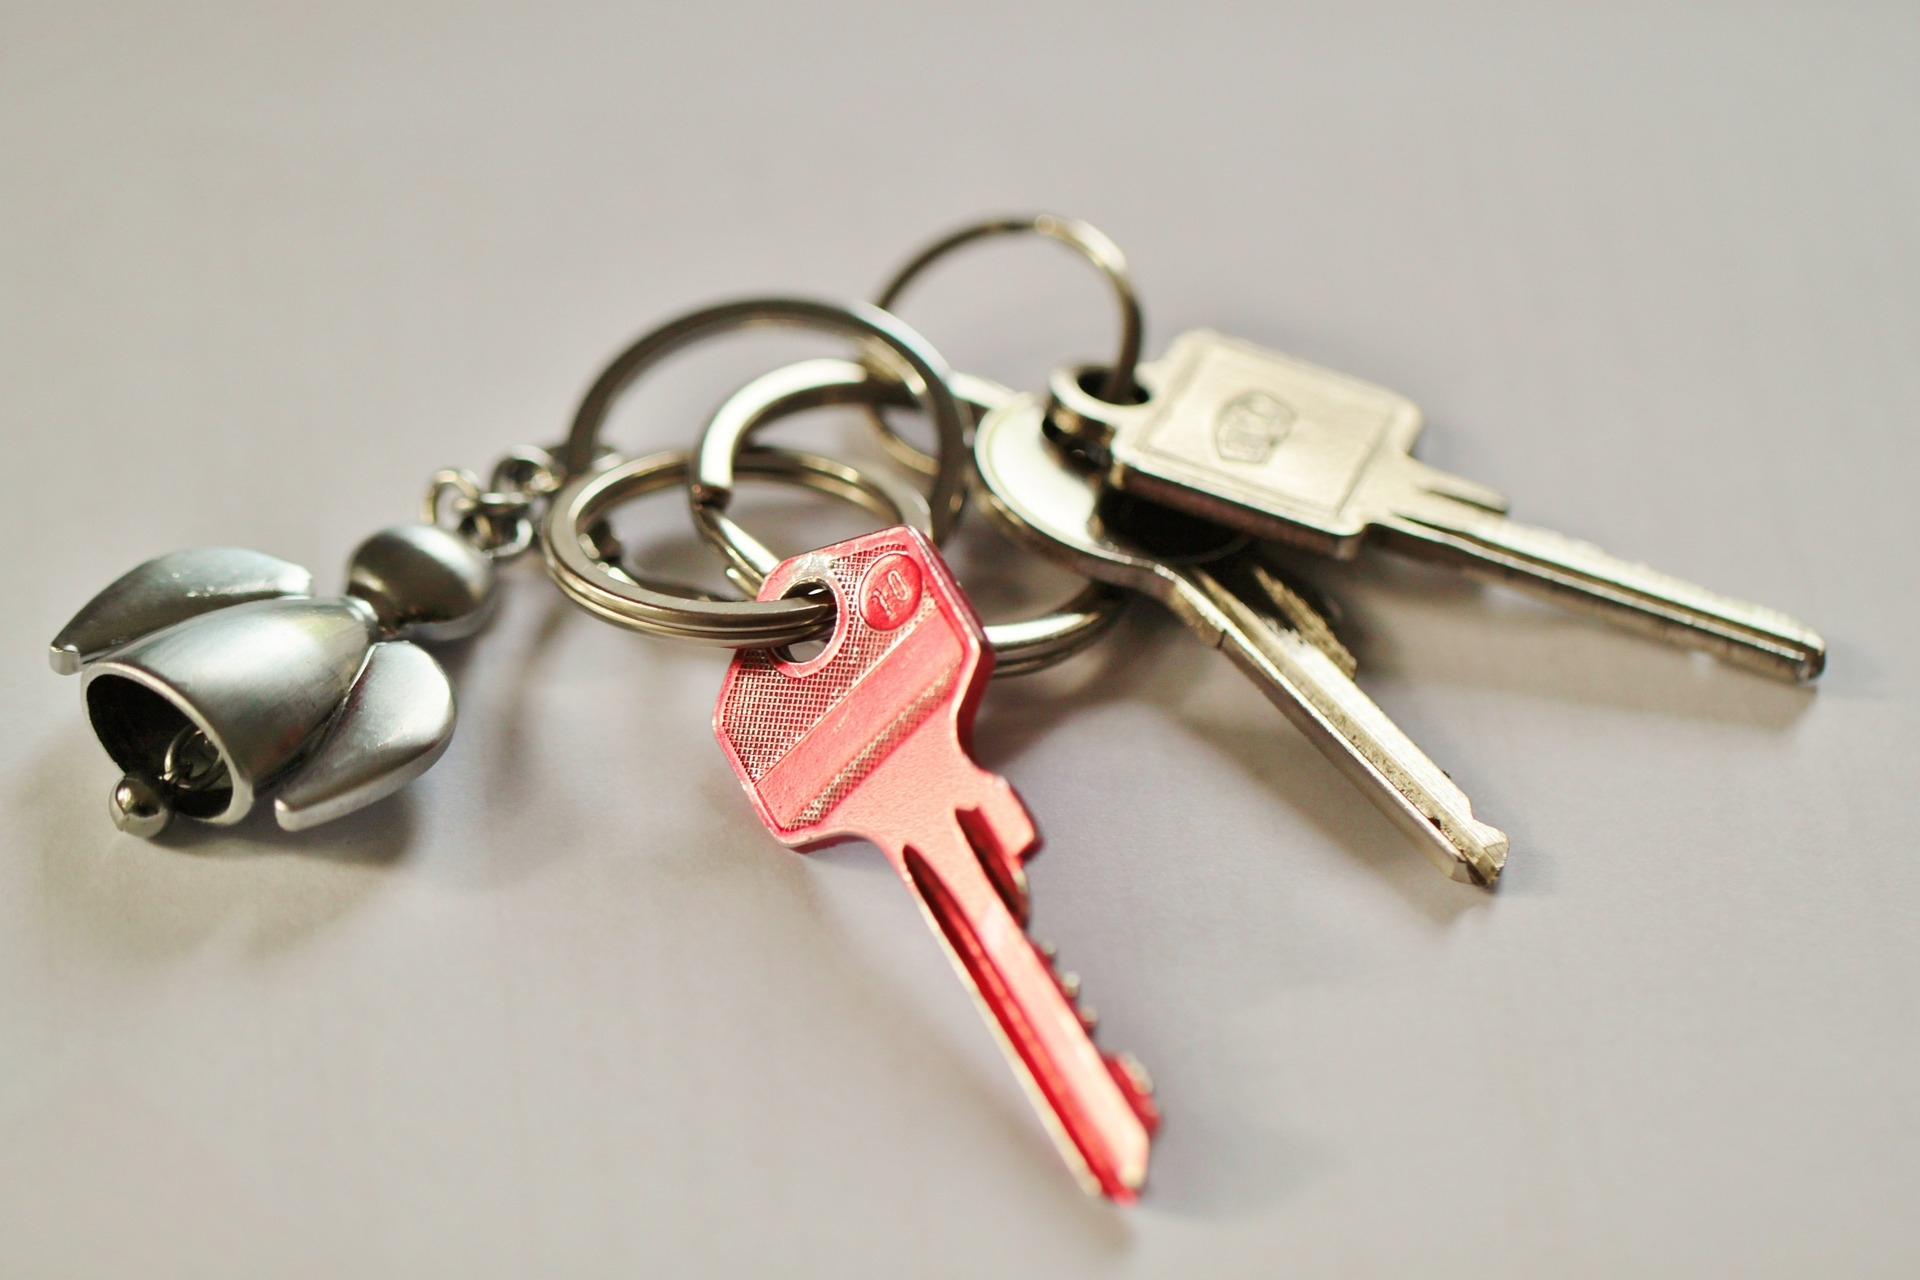 Keychain - 453500 - 1920